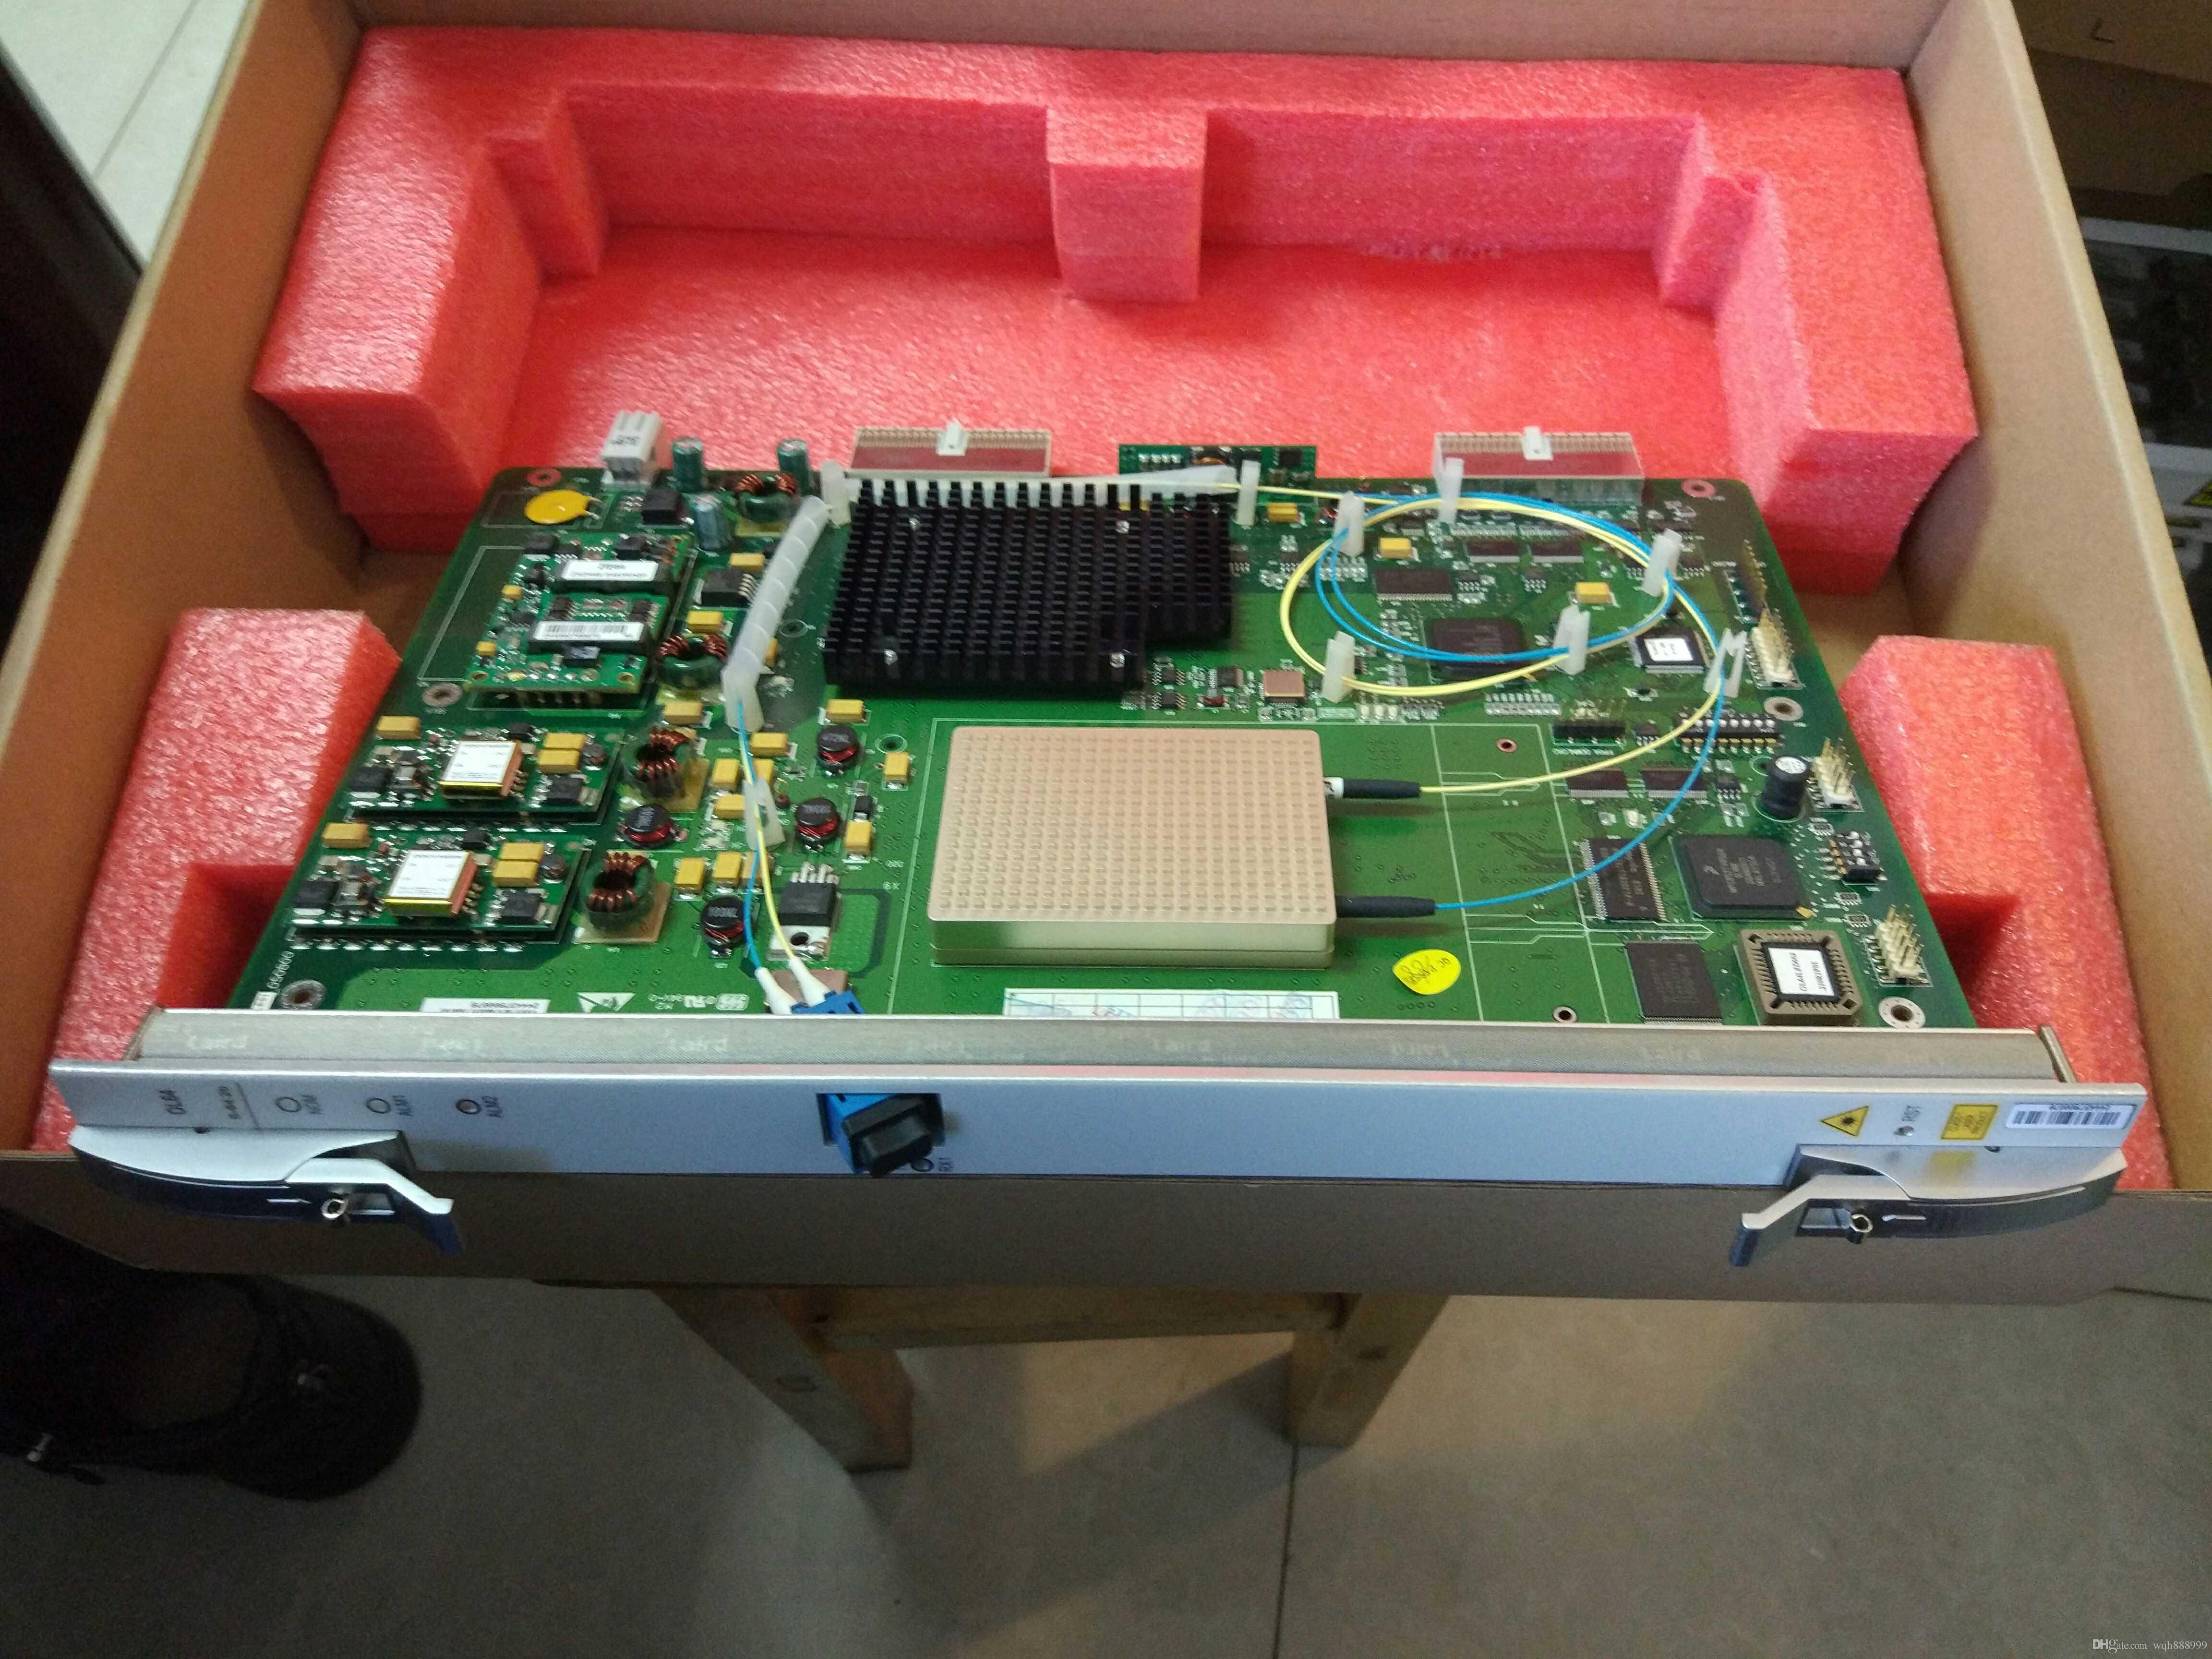 100% arbeiten für (ZTE SDH S385 OL64 S-64.2B) (ZTE 8905E MCS3A) (ZTE 52-4GE-RJ) (ZTE OLT C300 10G GPON GTXO) (ZTE M6000 RP-02XGE-SFP + S)